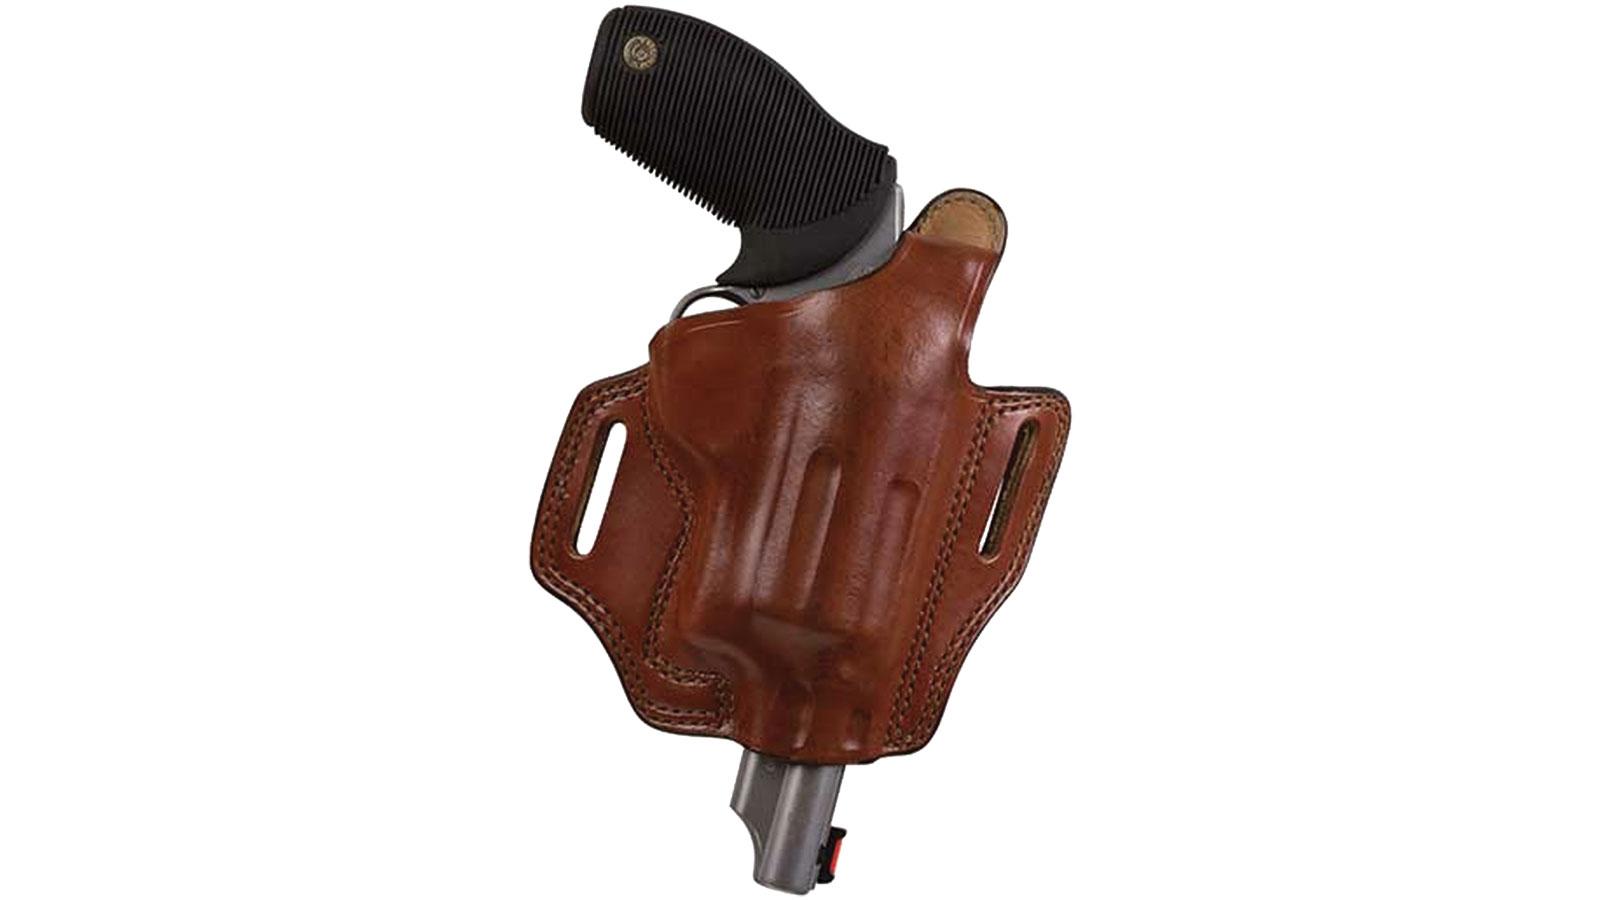 Bianchi 15190 5 Black Widow  9mm|40 Auto Glock 17|19|22|23|26|27|34|35 Leather Tan